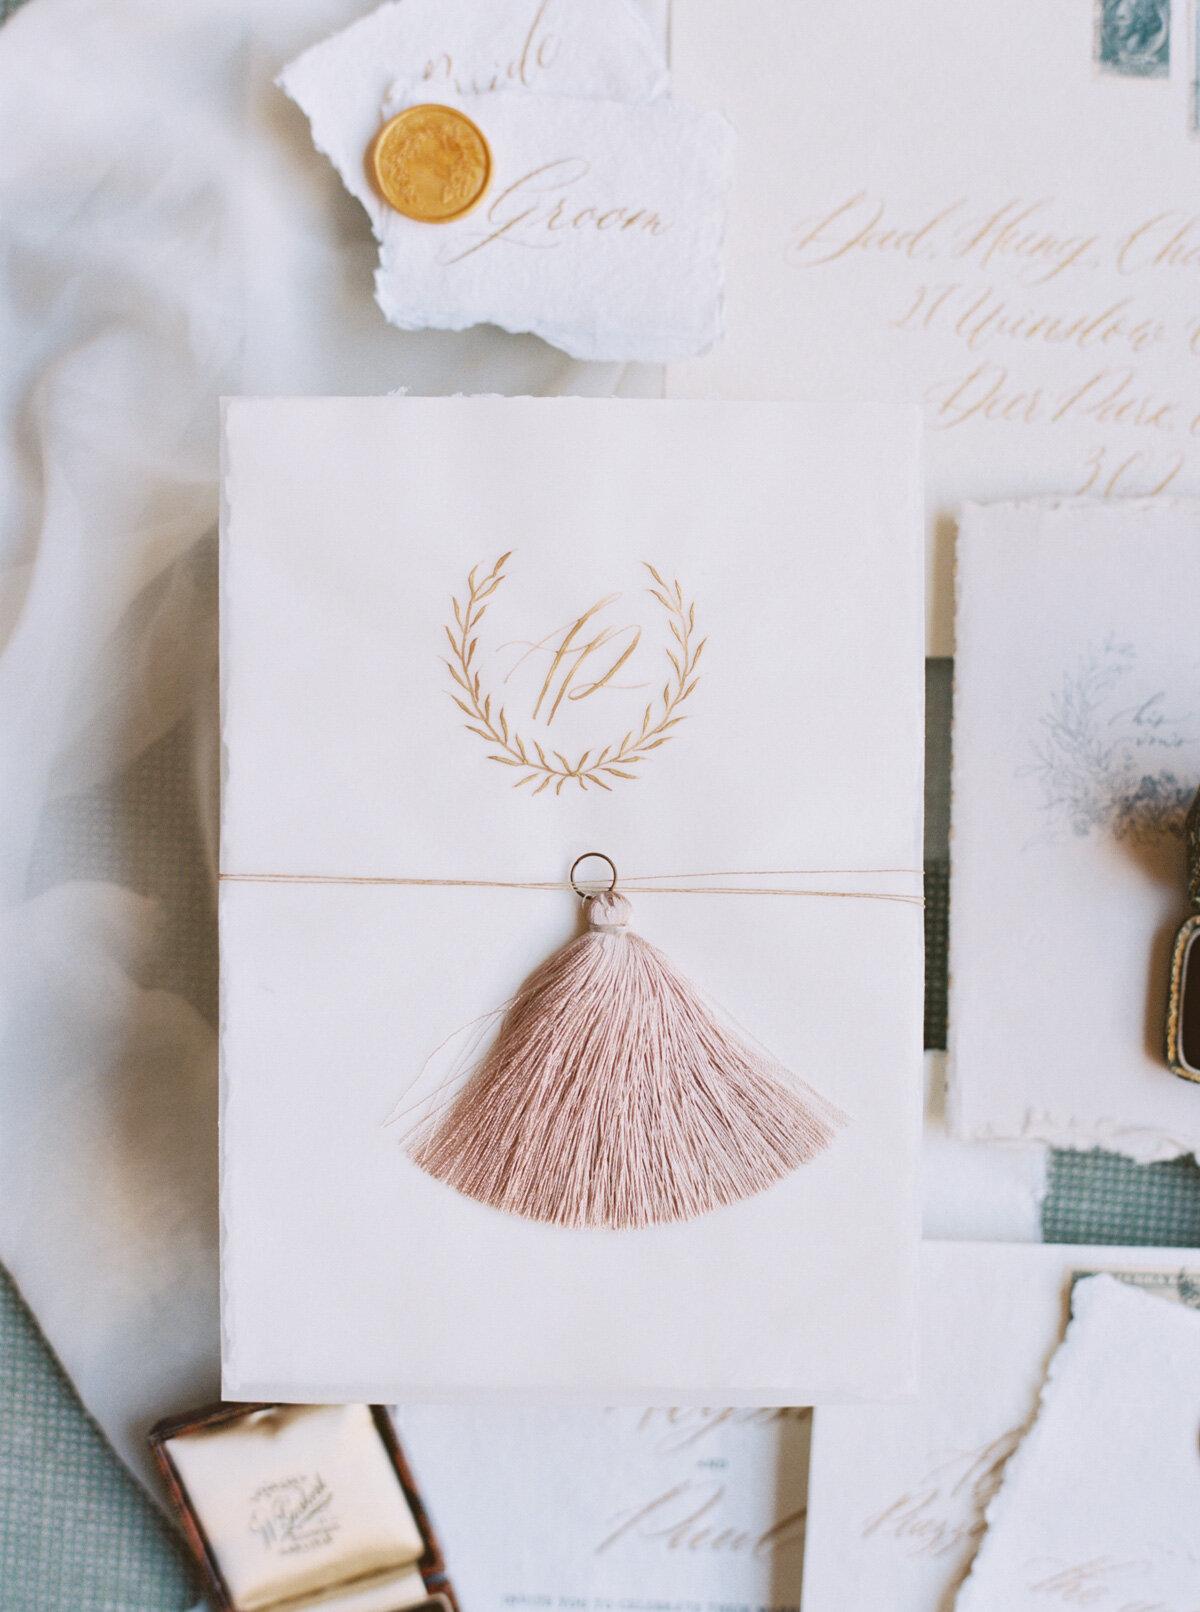 Belmond-Hotel-Caruso-ravello-elopement-Katie-Grant-destination-wedding (4 of 50).jpg